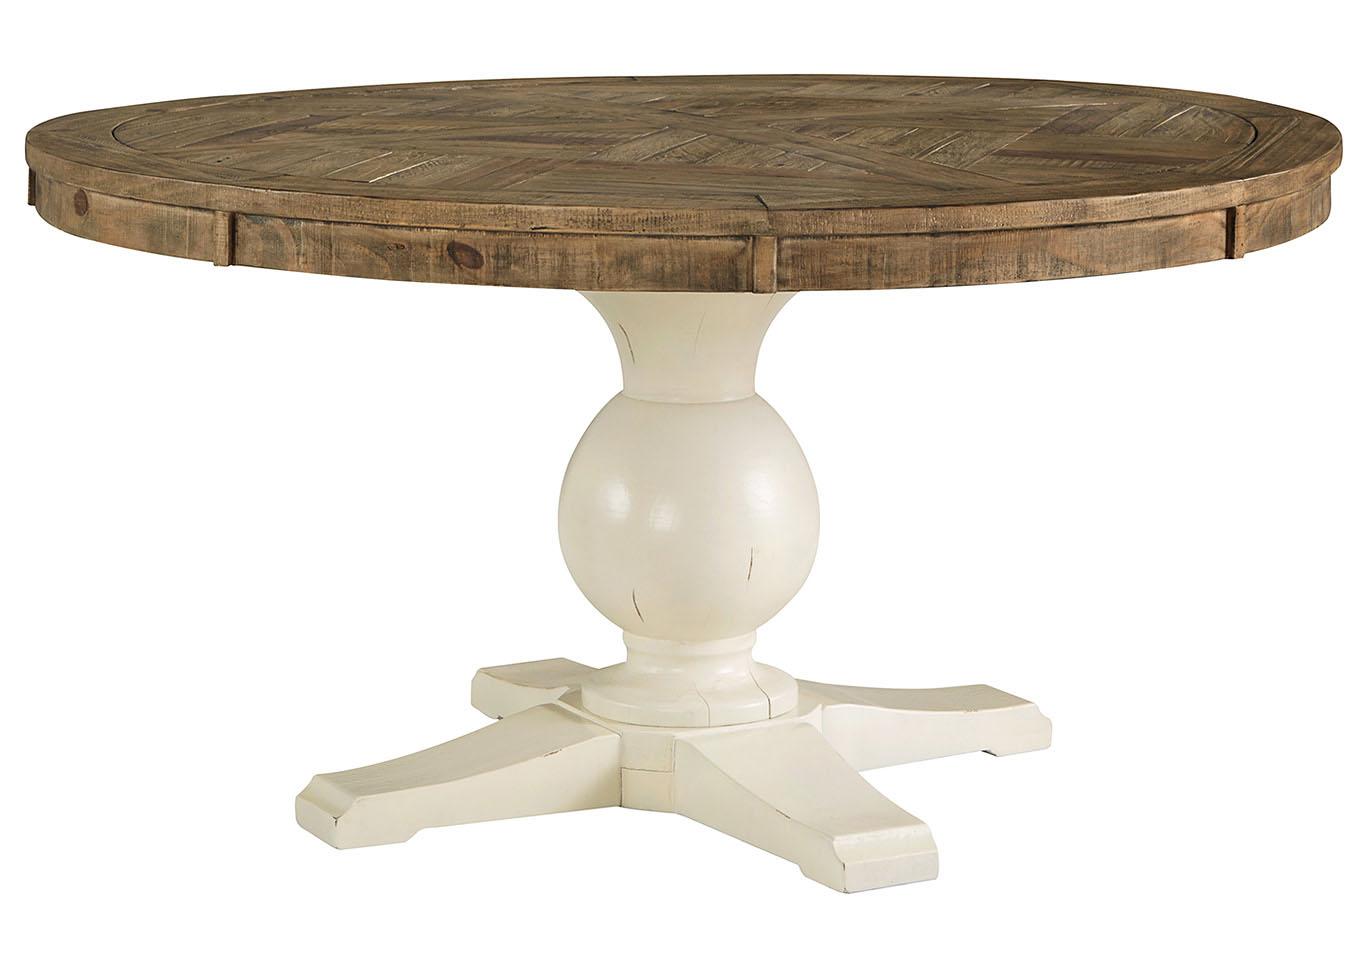 Grindleburg Table